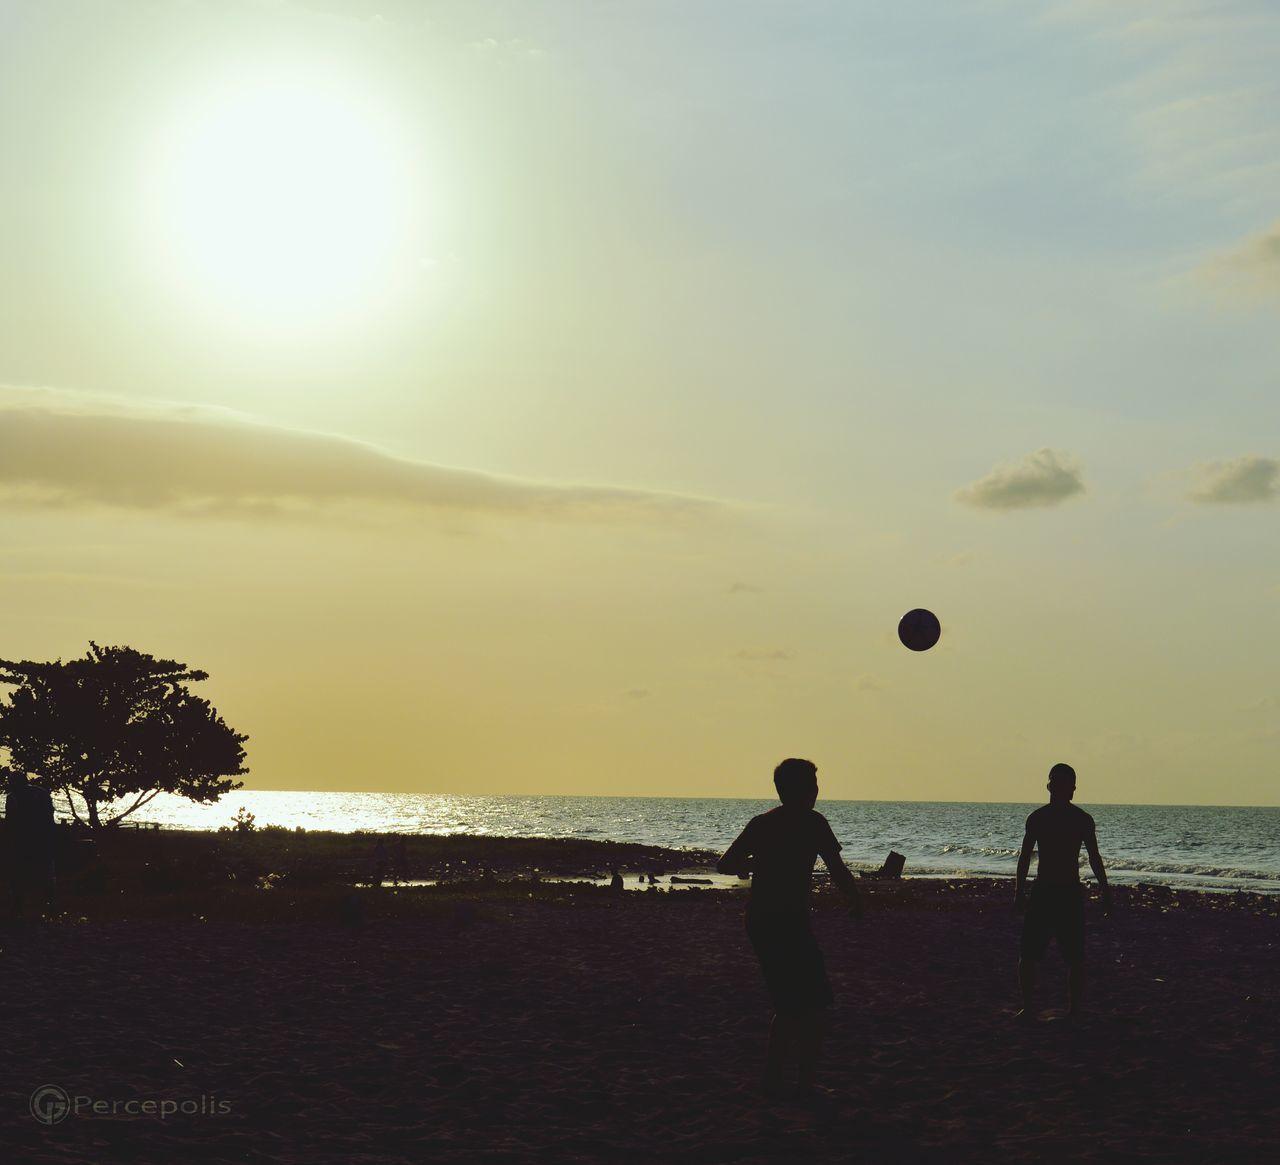 Percepolis12 Futbol Honduras Playa Omoa Nikon D3200 NikonLife Fotografia Sol Beach